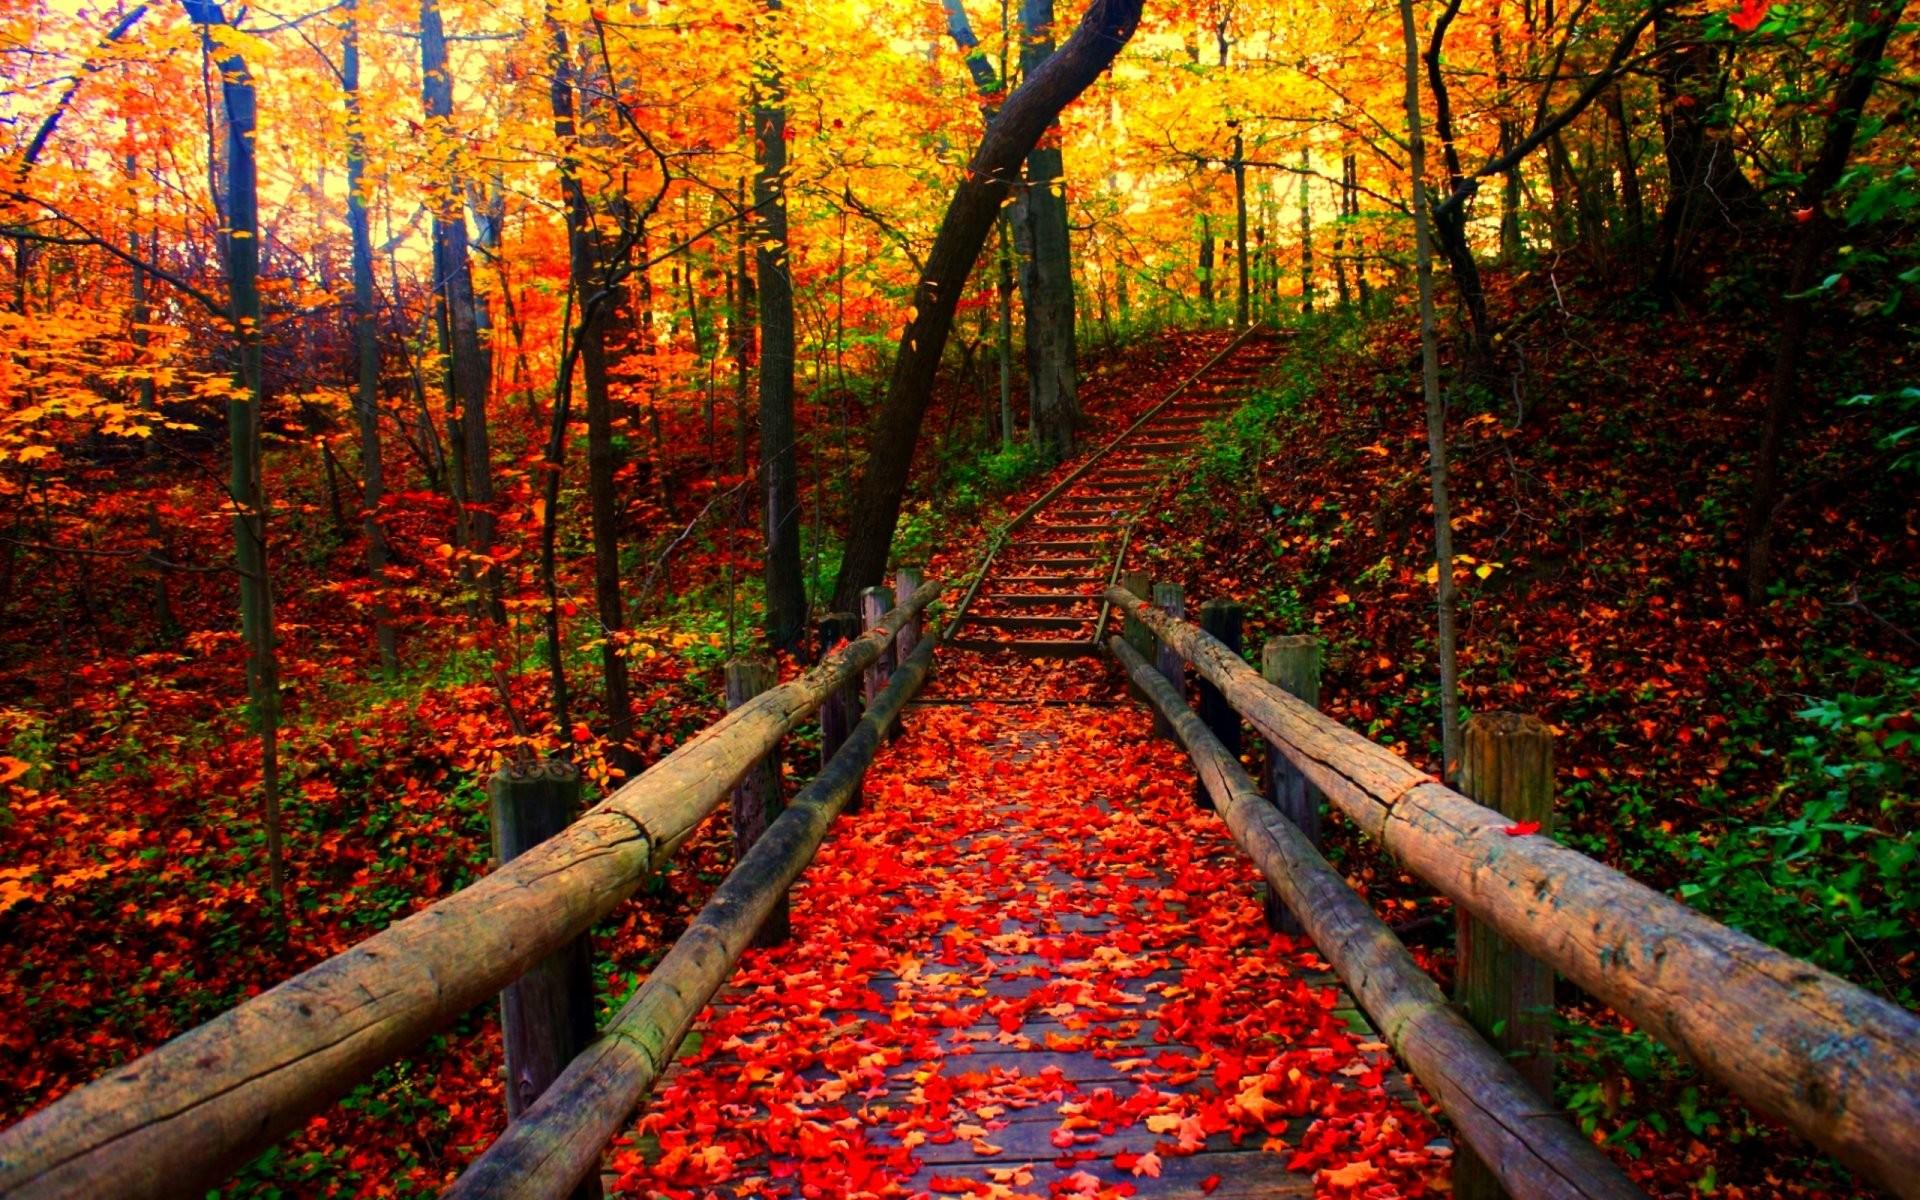 Leaves: Autumn Fall Season Leaf Tree Forest Seasons Nature Landscape ...